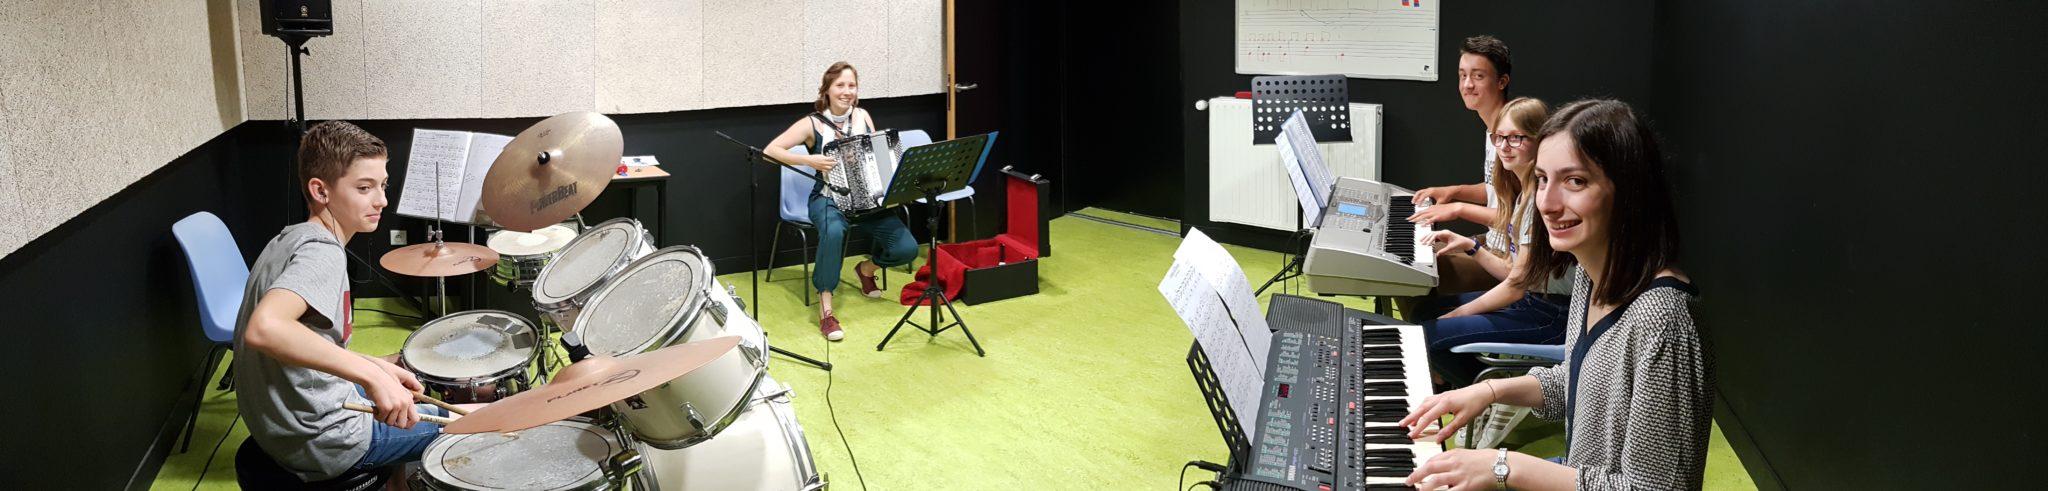 Cours accordéon, piano, clavier 85, 49, 79, 44